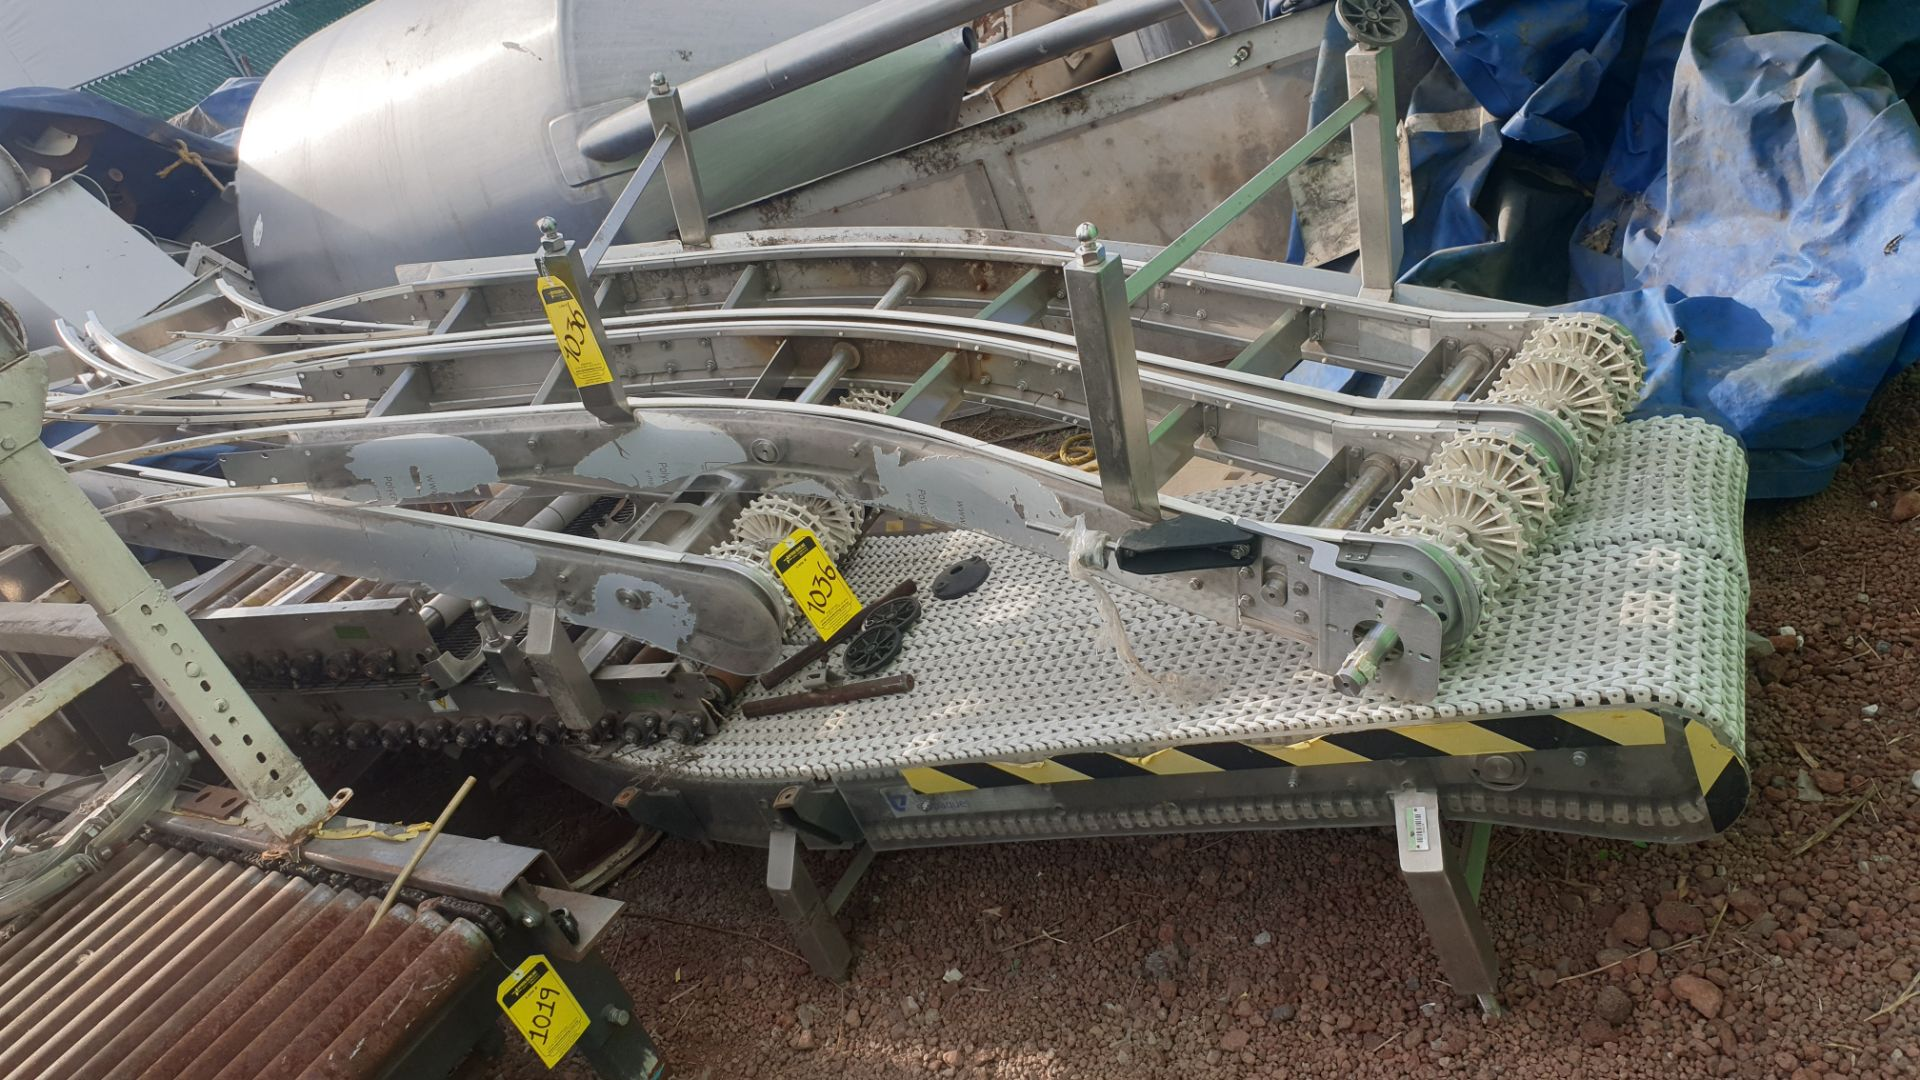 S conveyor belt batch. Please inspect - Image 9 of 9